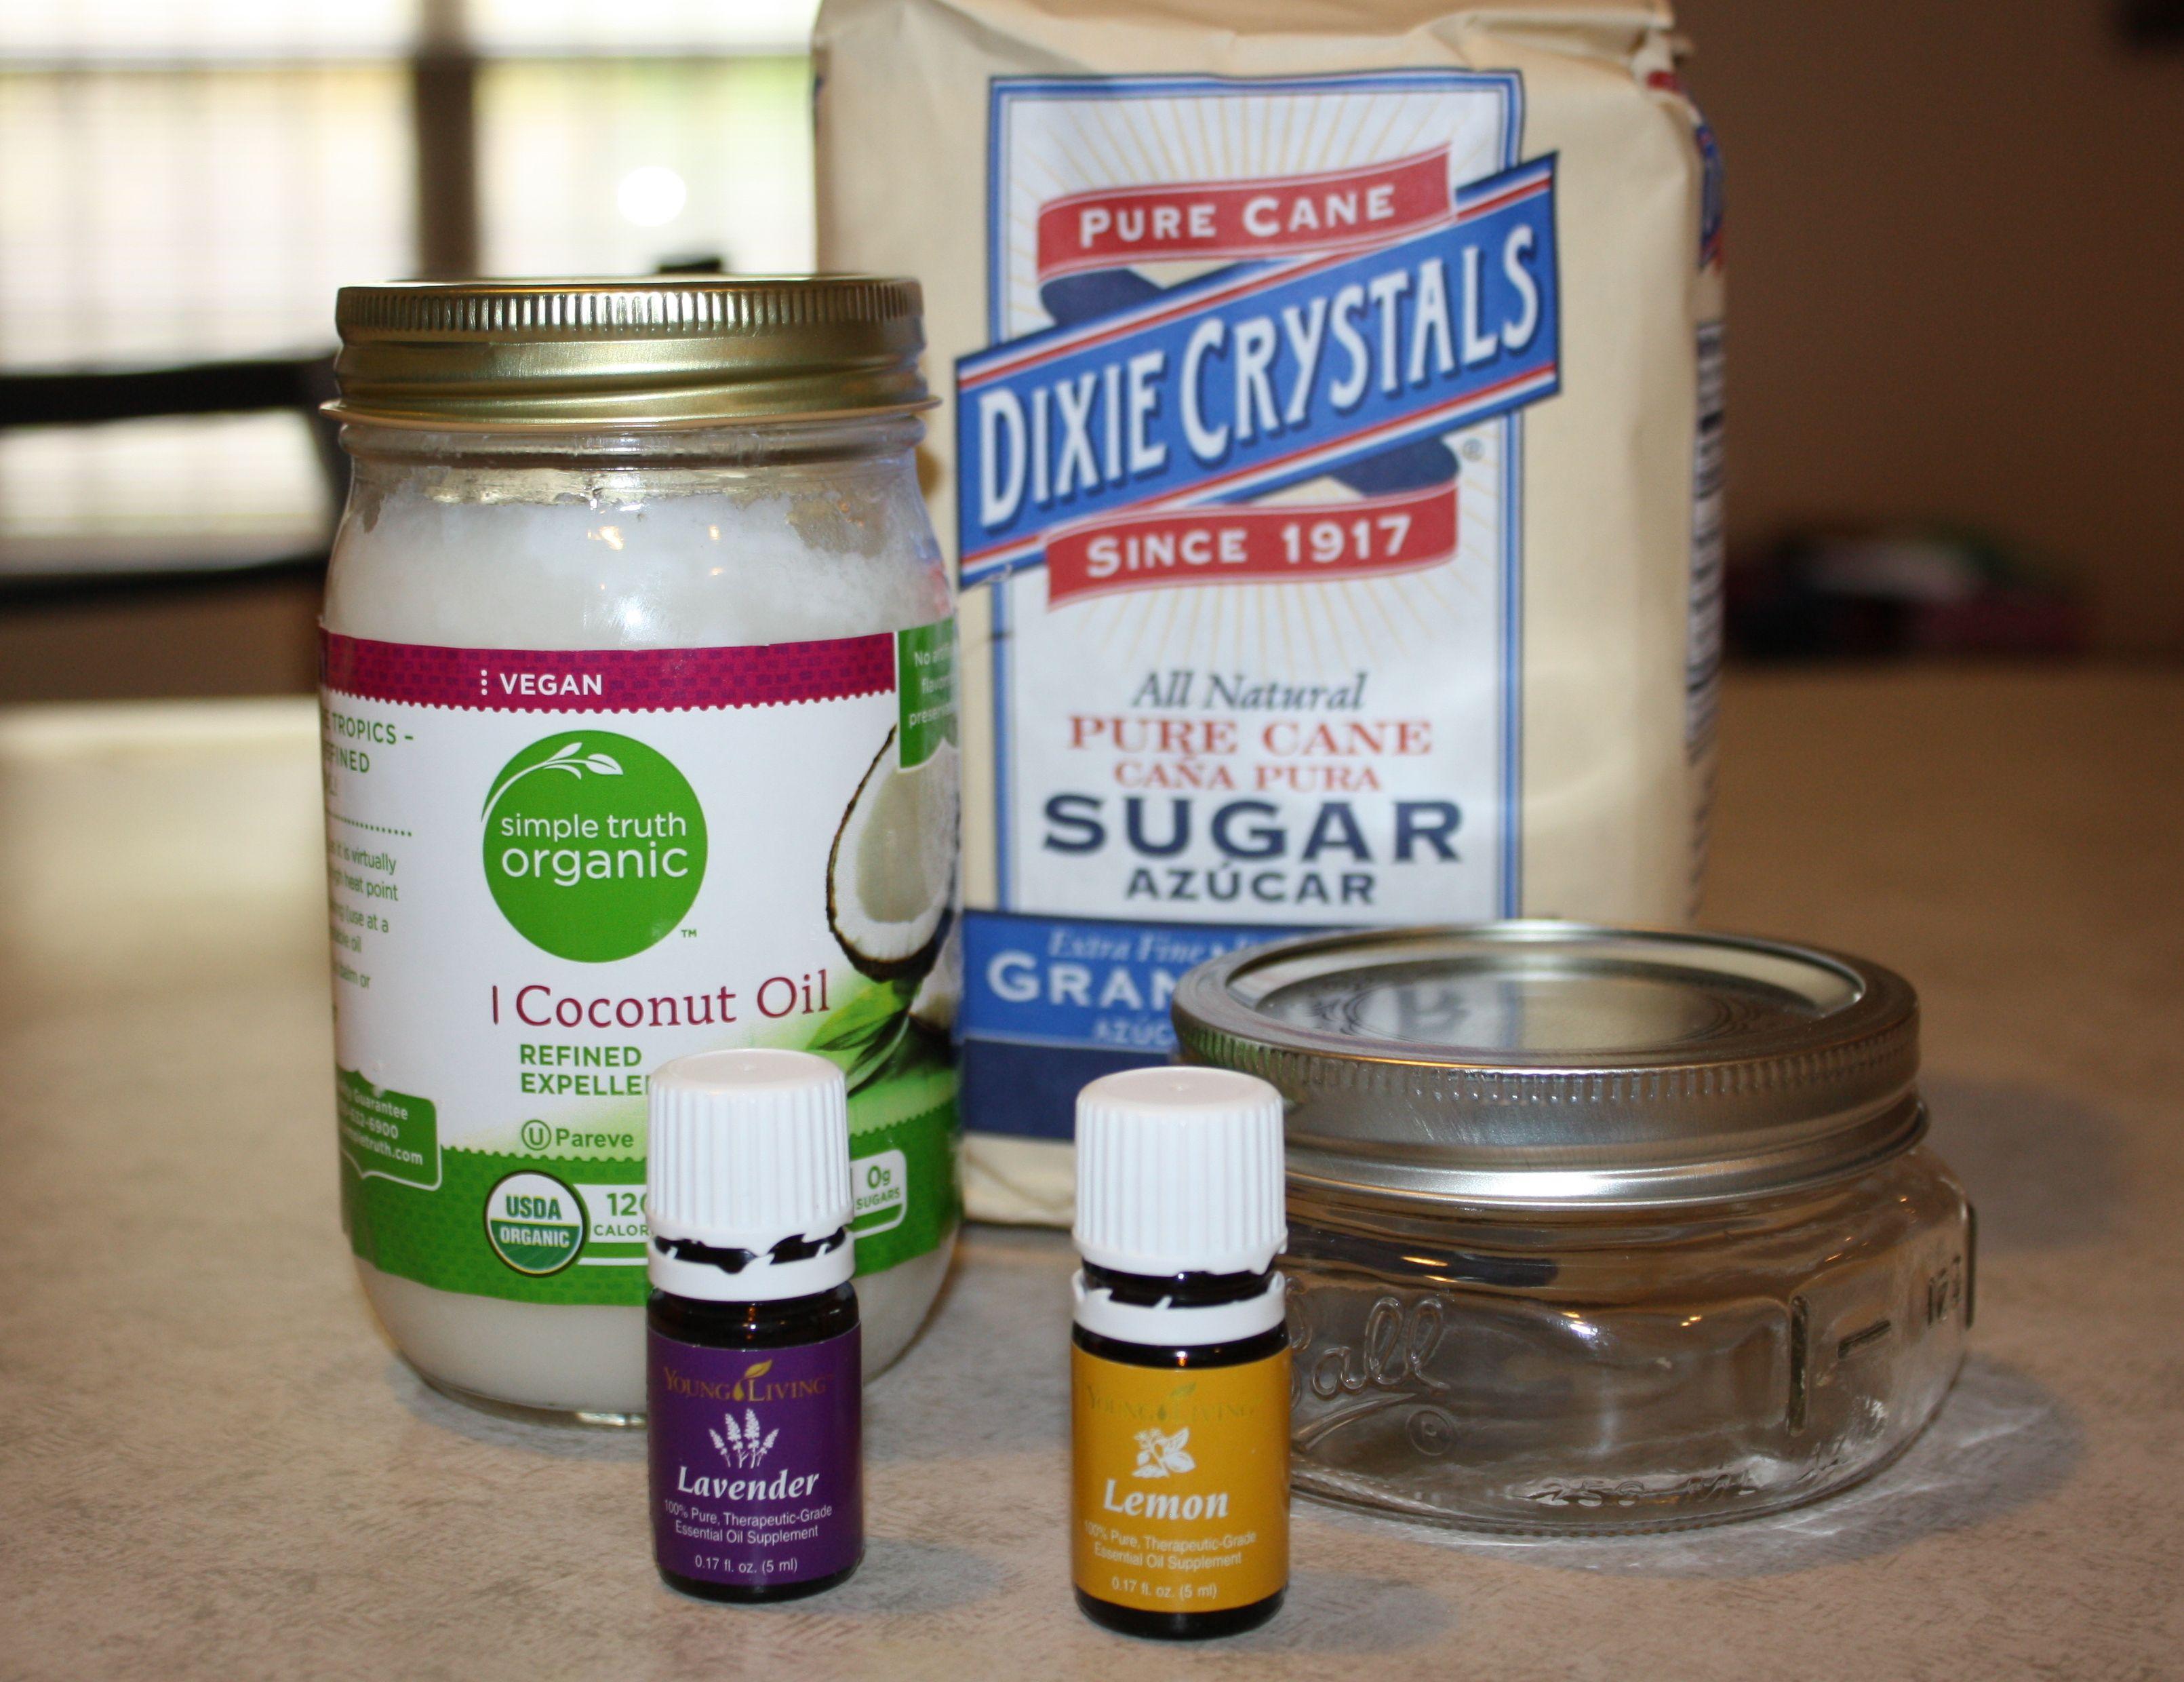 Sugar Scrub Ingredients Lavender sugar scrub, Lemon